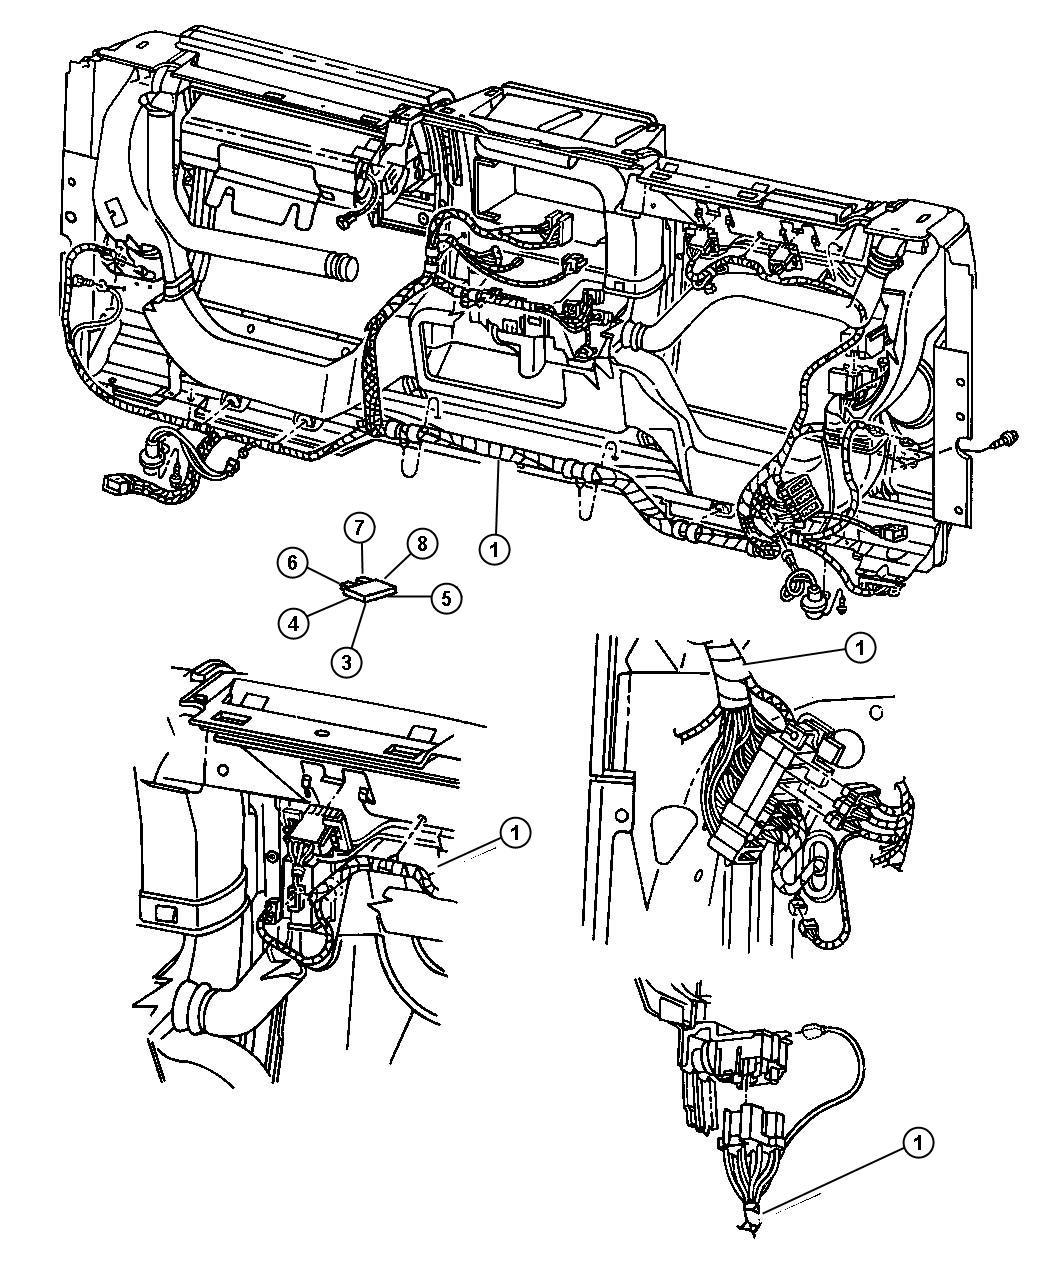 Diagram Of Jeep Wrangler 6 Cylinder Fuse Panel